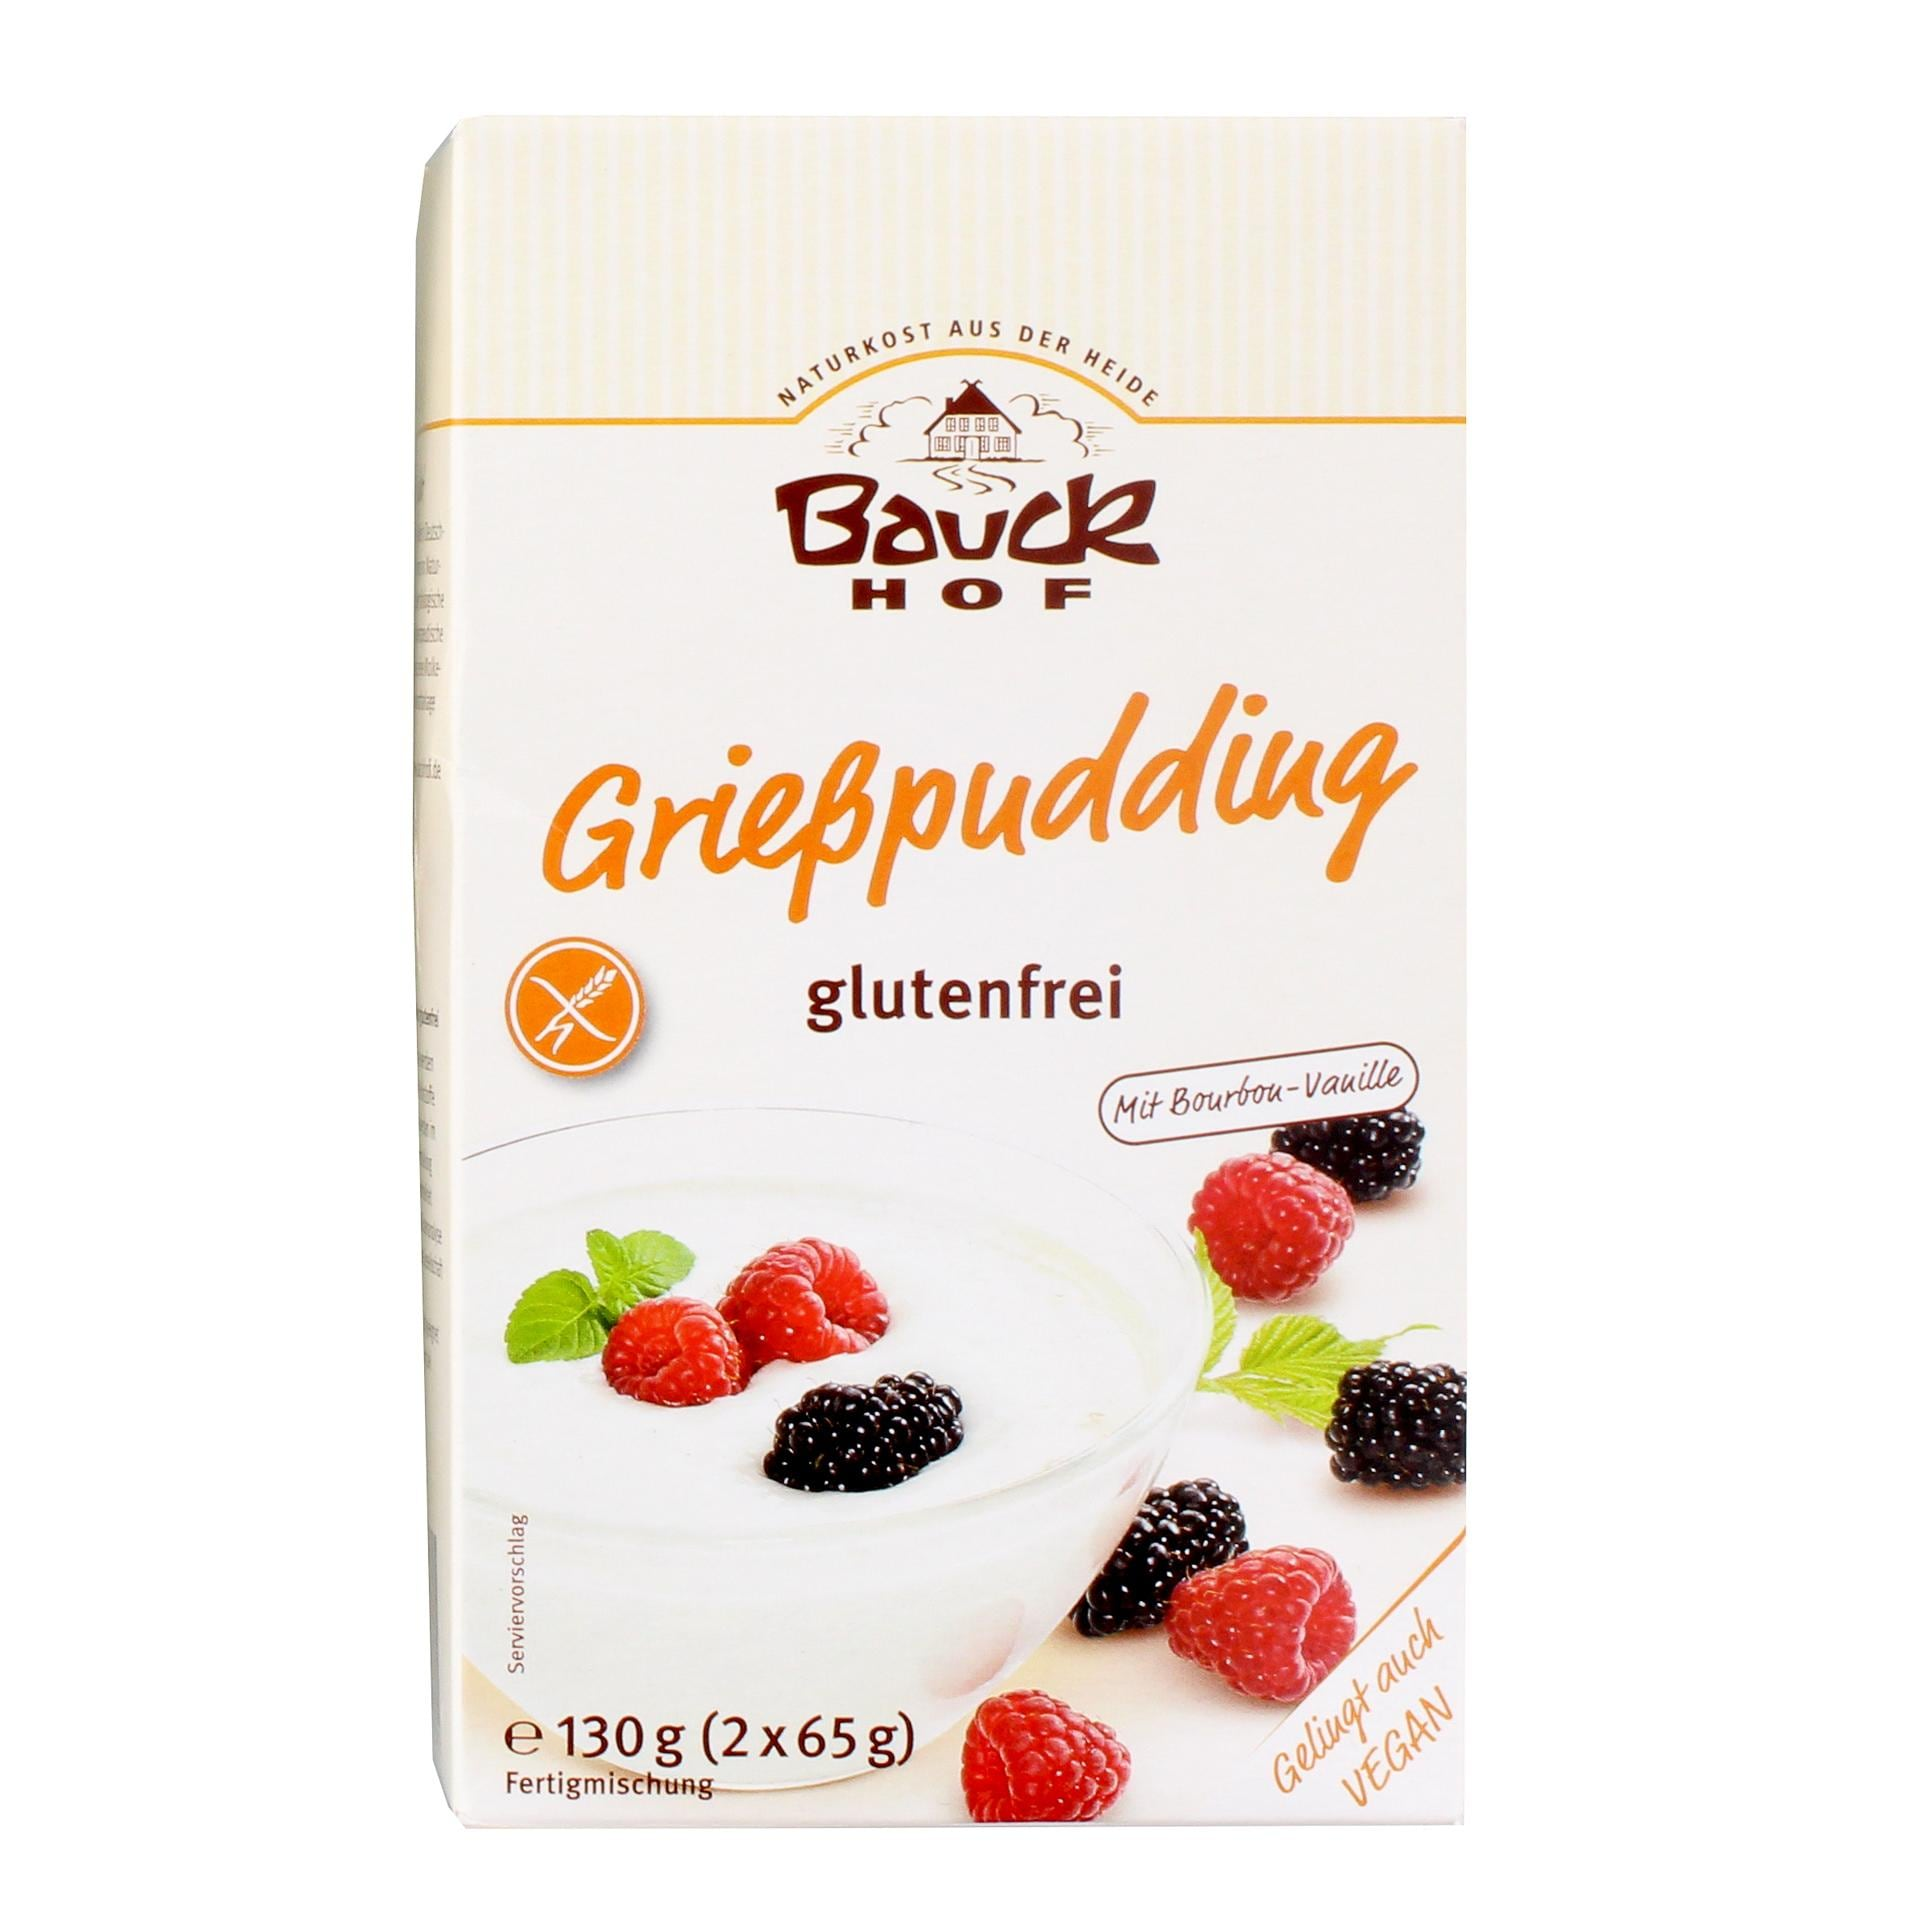 Bauck Bio Grießpudding 130g